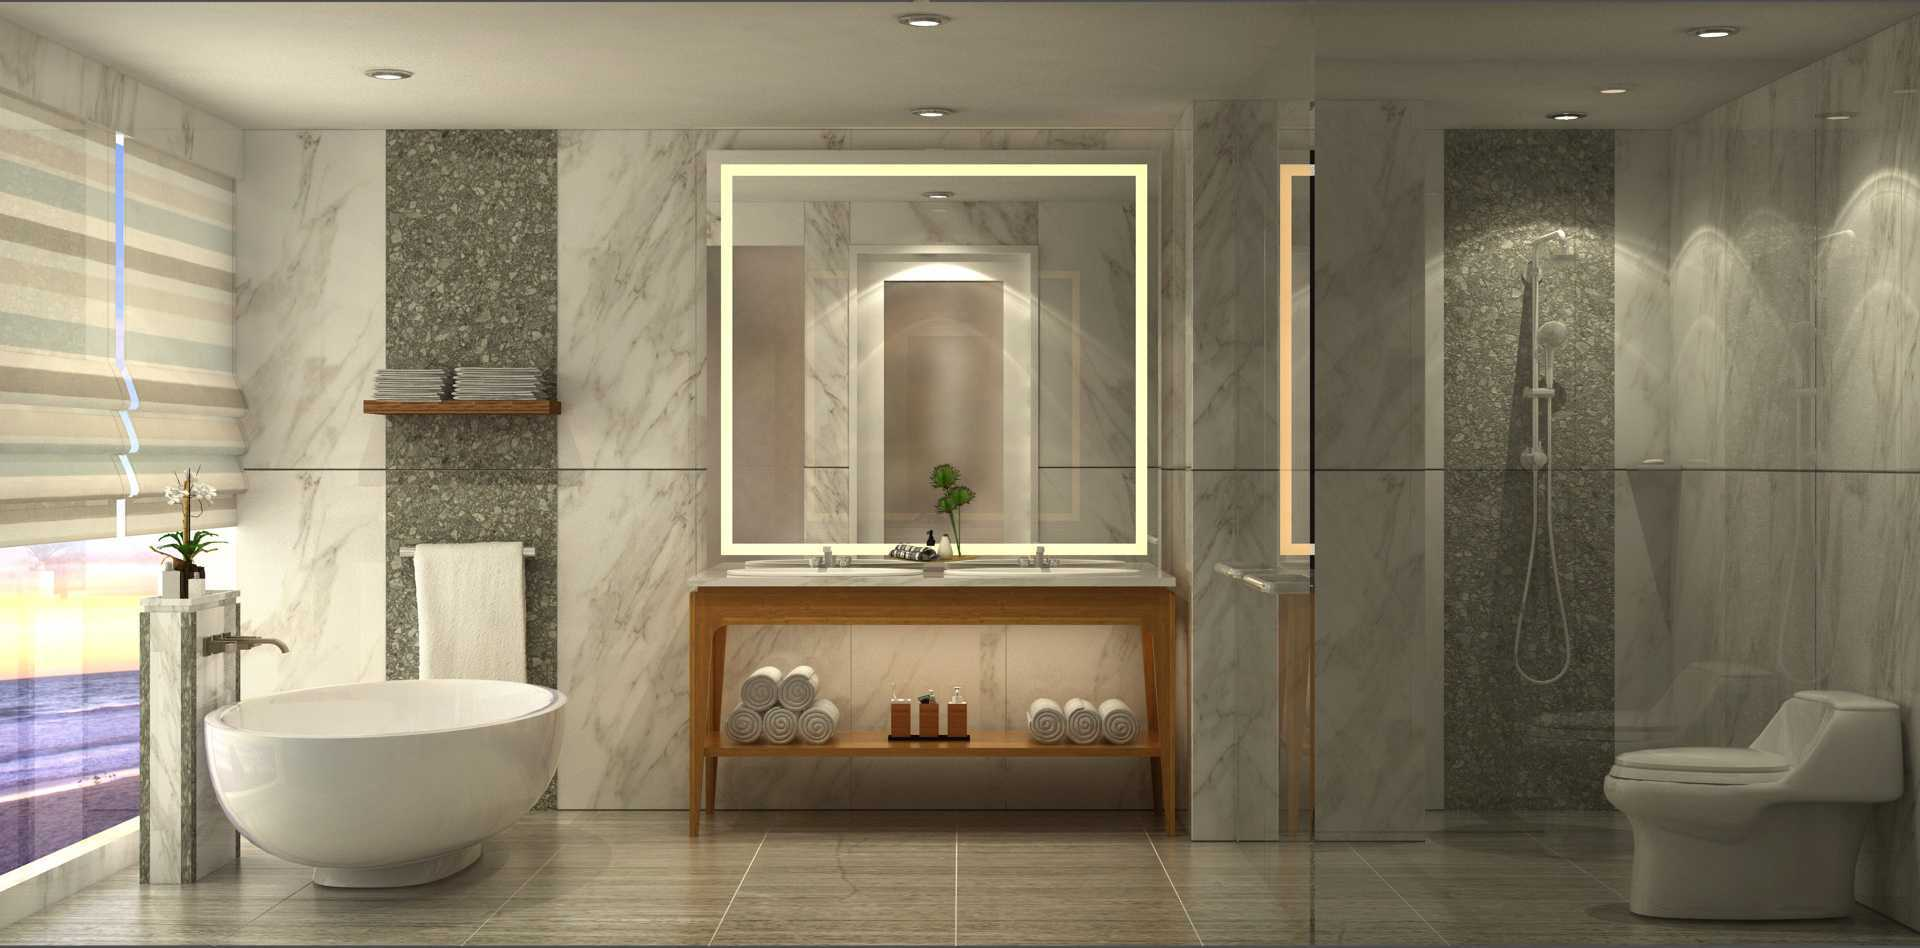 Vin•da•te Hotel Canggu Beach Bali - Indonesia Bali - Indonesia Bathroom Kontemporer  17582